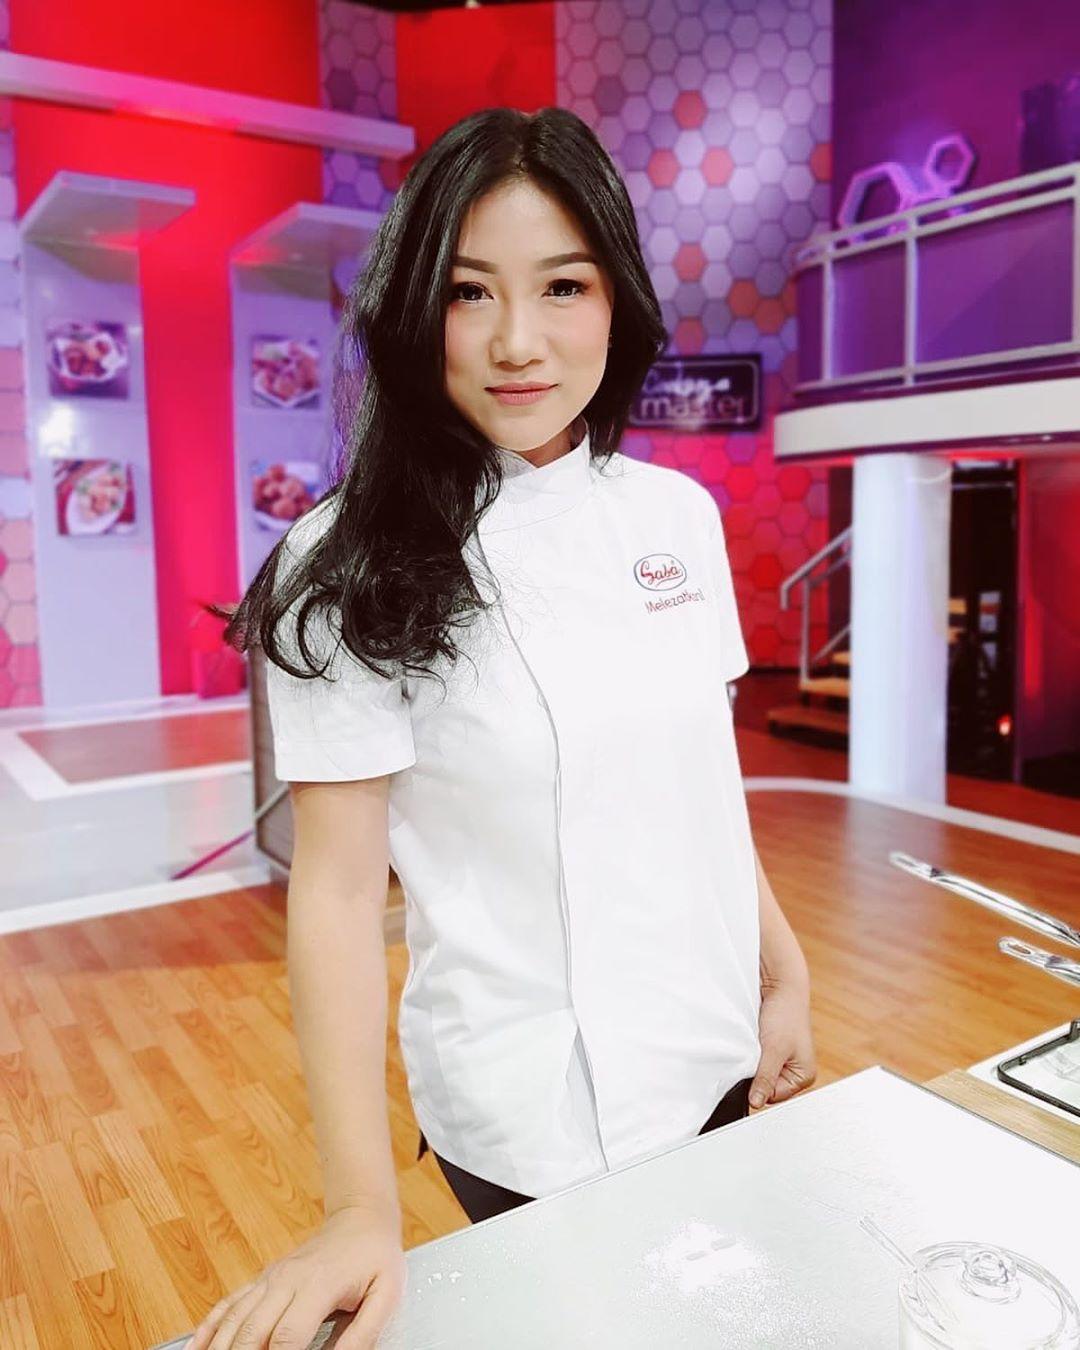 Biodata, Profil dan Fakta Menarik Chef Vania Wibisono